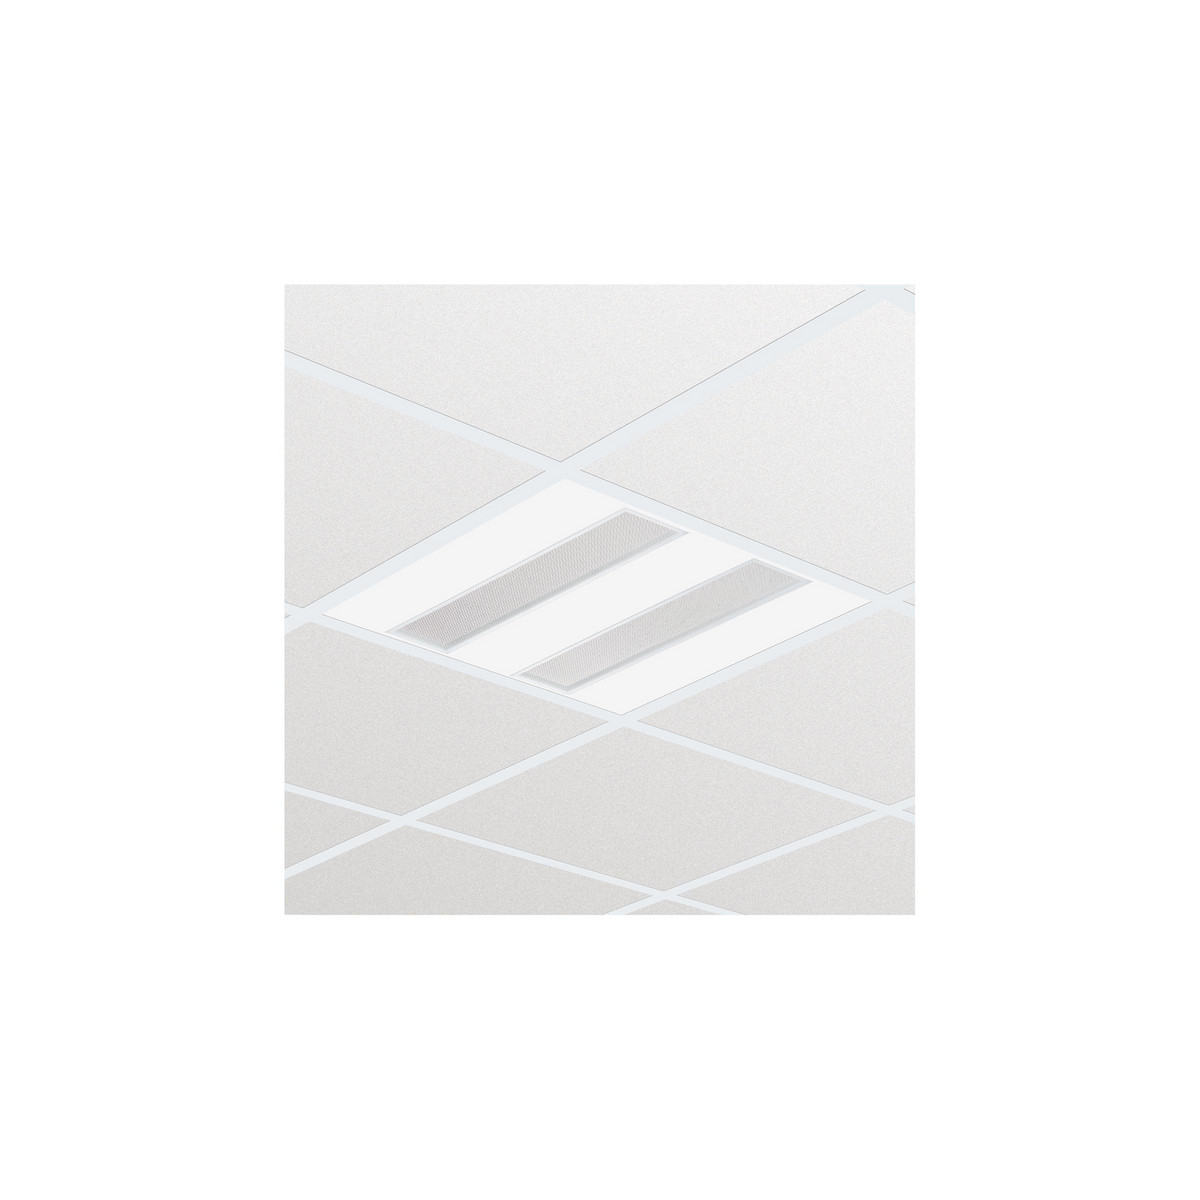 Philips FlexBlend Indbyg RC340B LED 3600lm/940 DALI 60x60 Synlig T-skinne MLO-optik